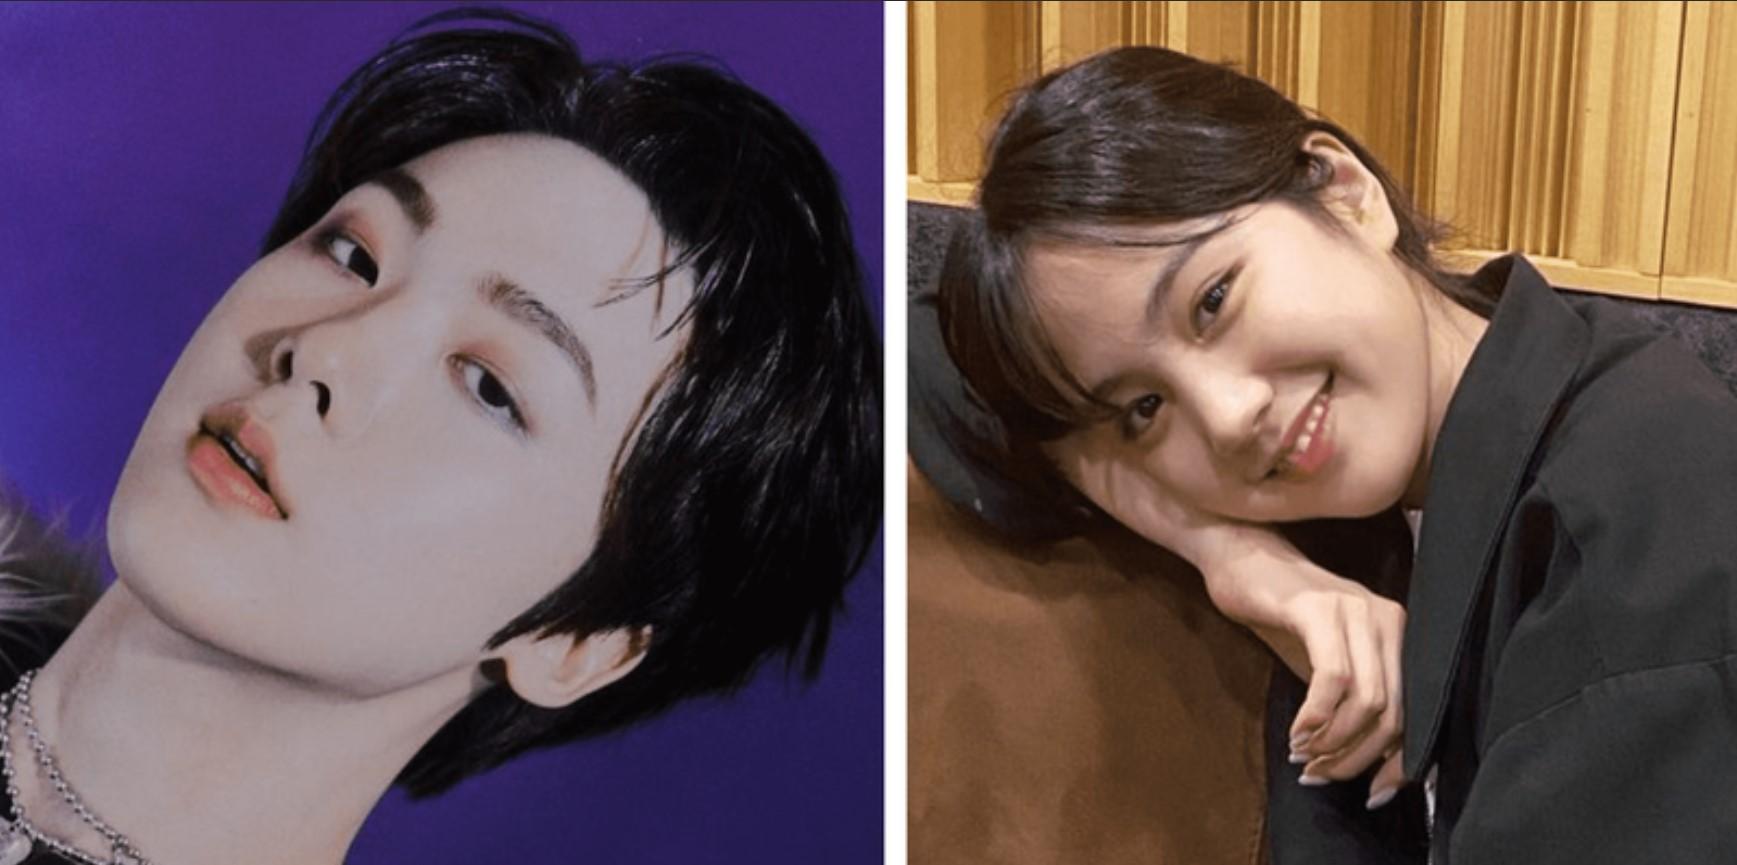 Yoon San Ha and Park Su Min